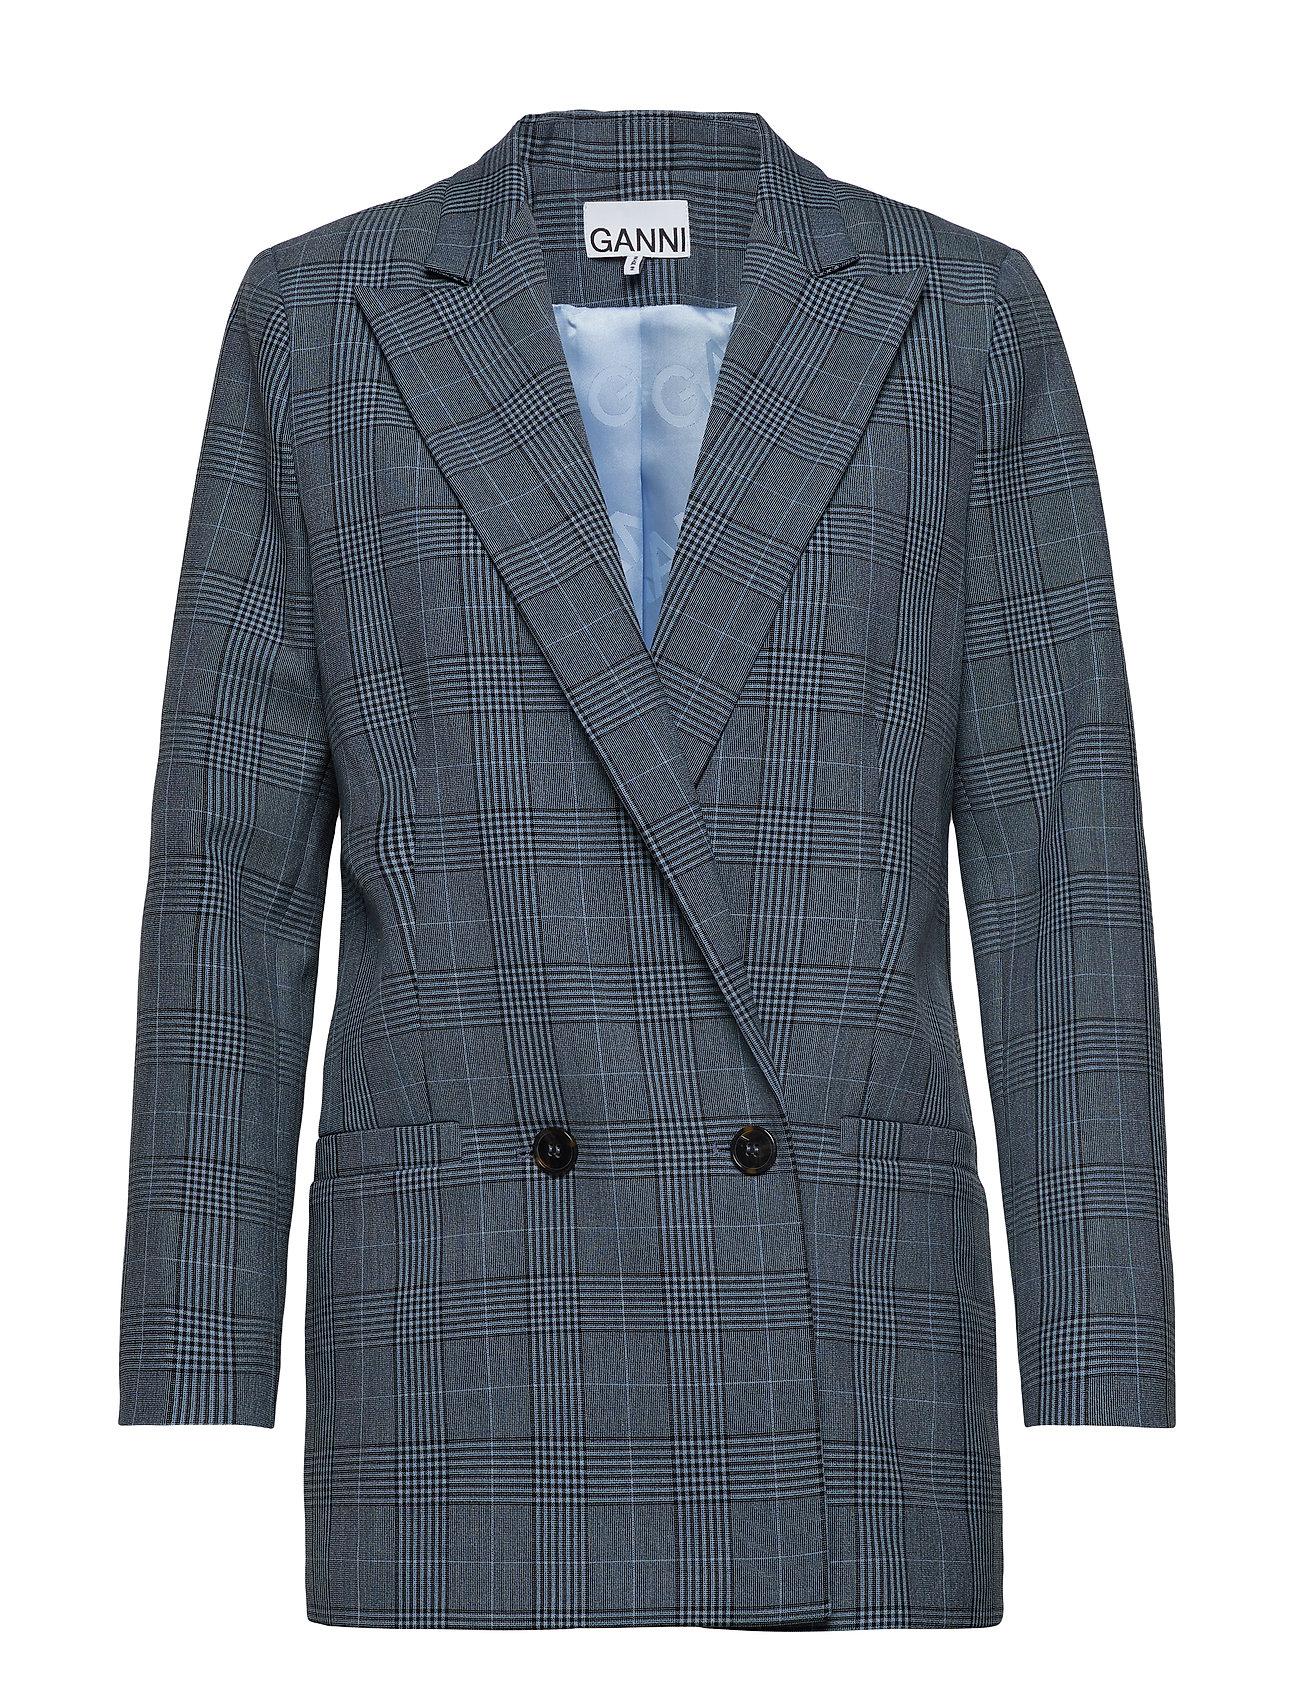 Ganni Suiting Blazer - FOREVER BLUE